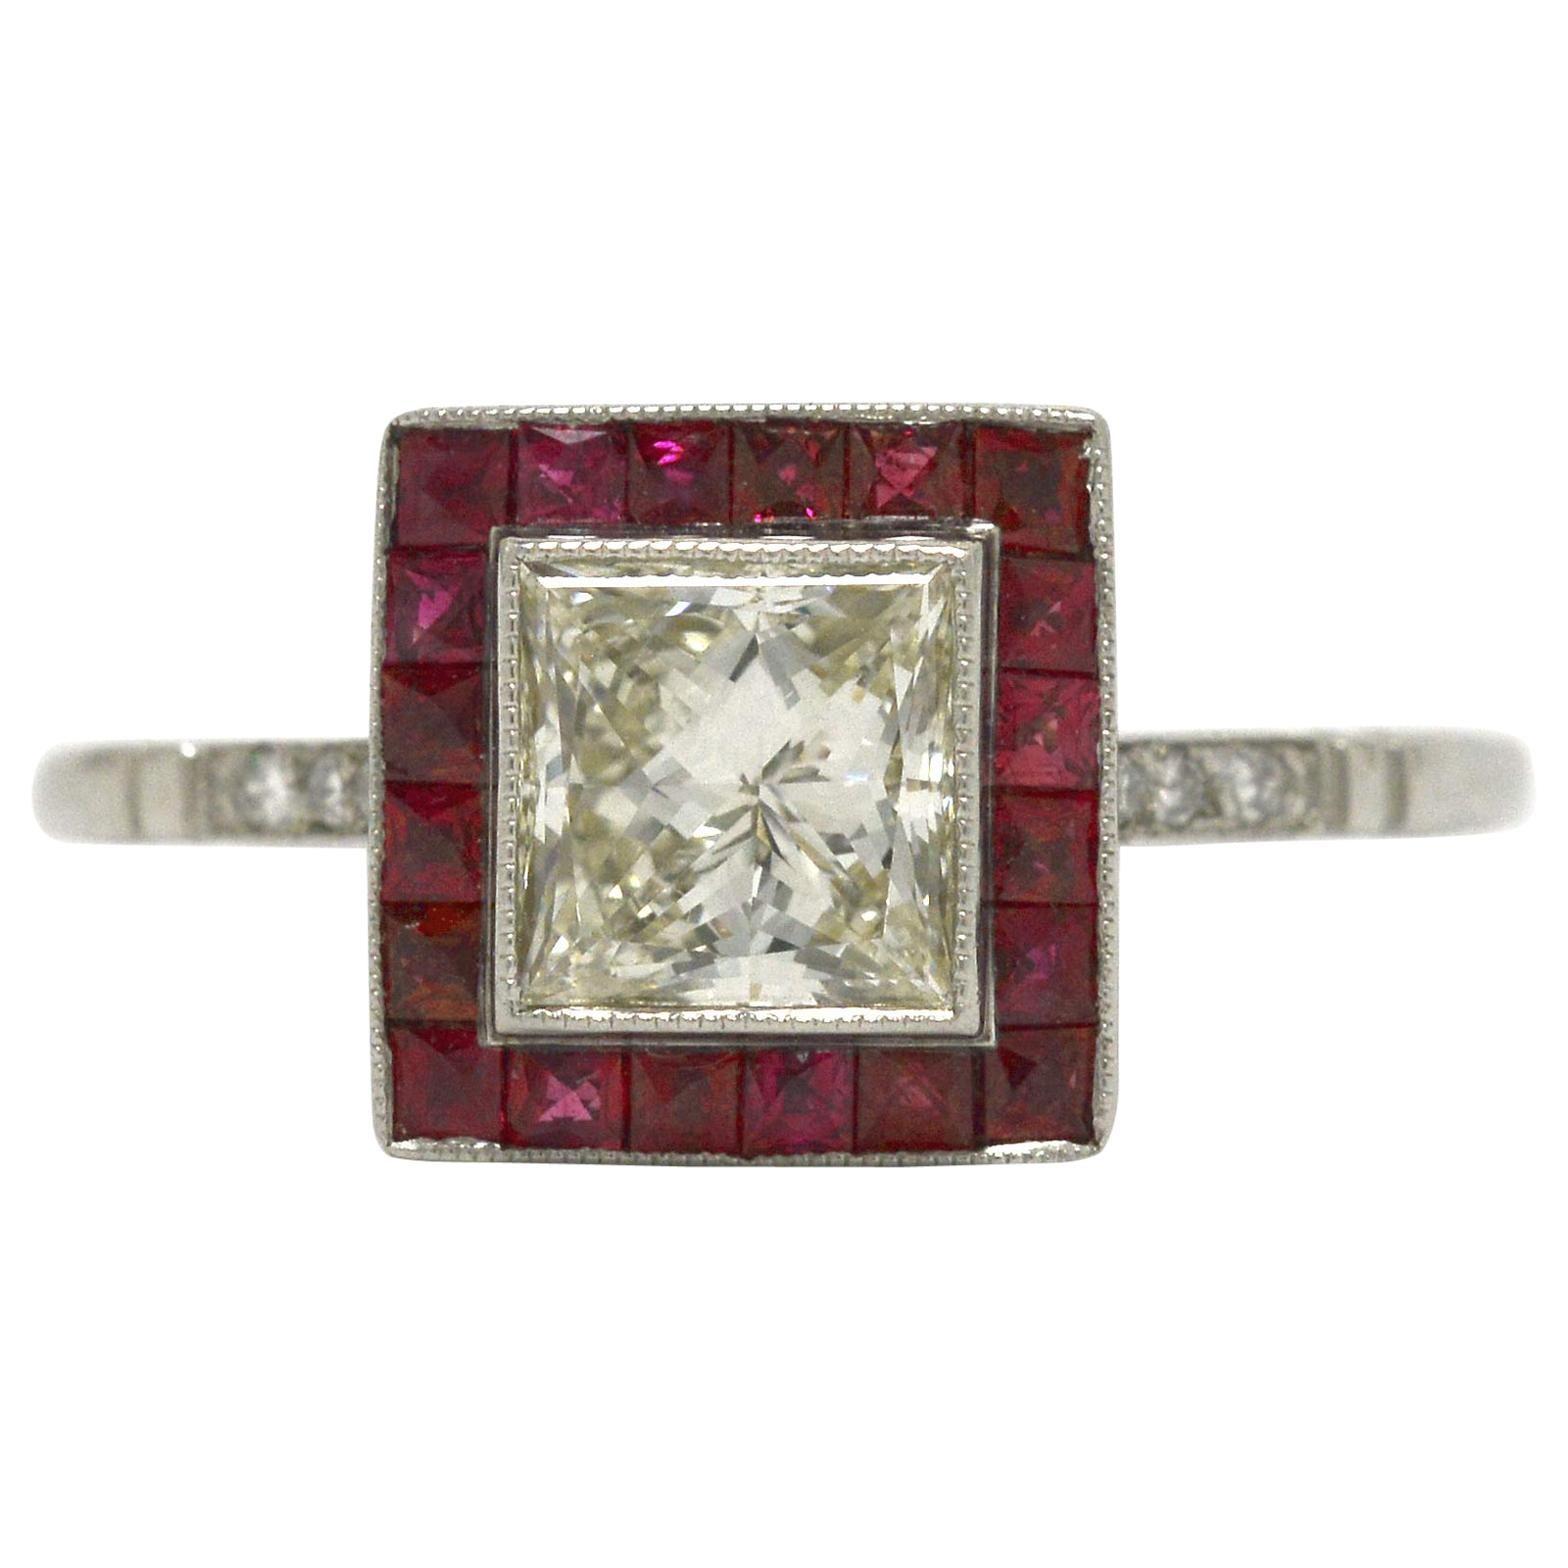 1 Carat Princess Cut Diamond Ruby Halo Art Deco Style Platinum Engagement Ring